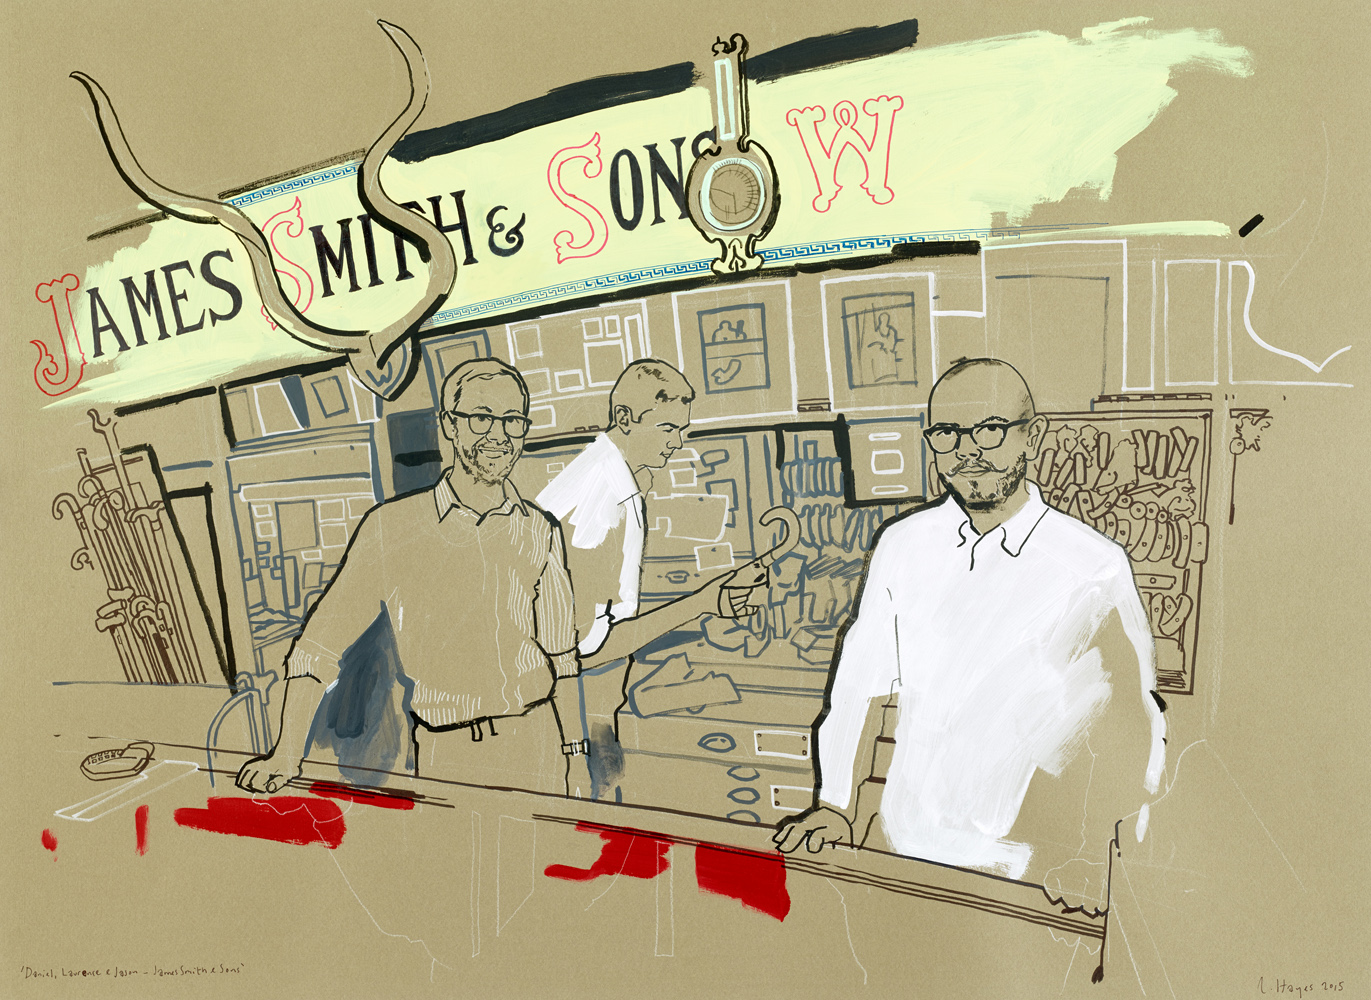 daniel, laurance & jason. james smith & sons, umbrella shop-new oxford street